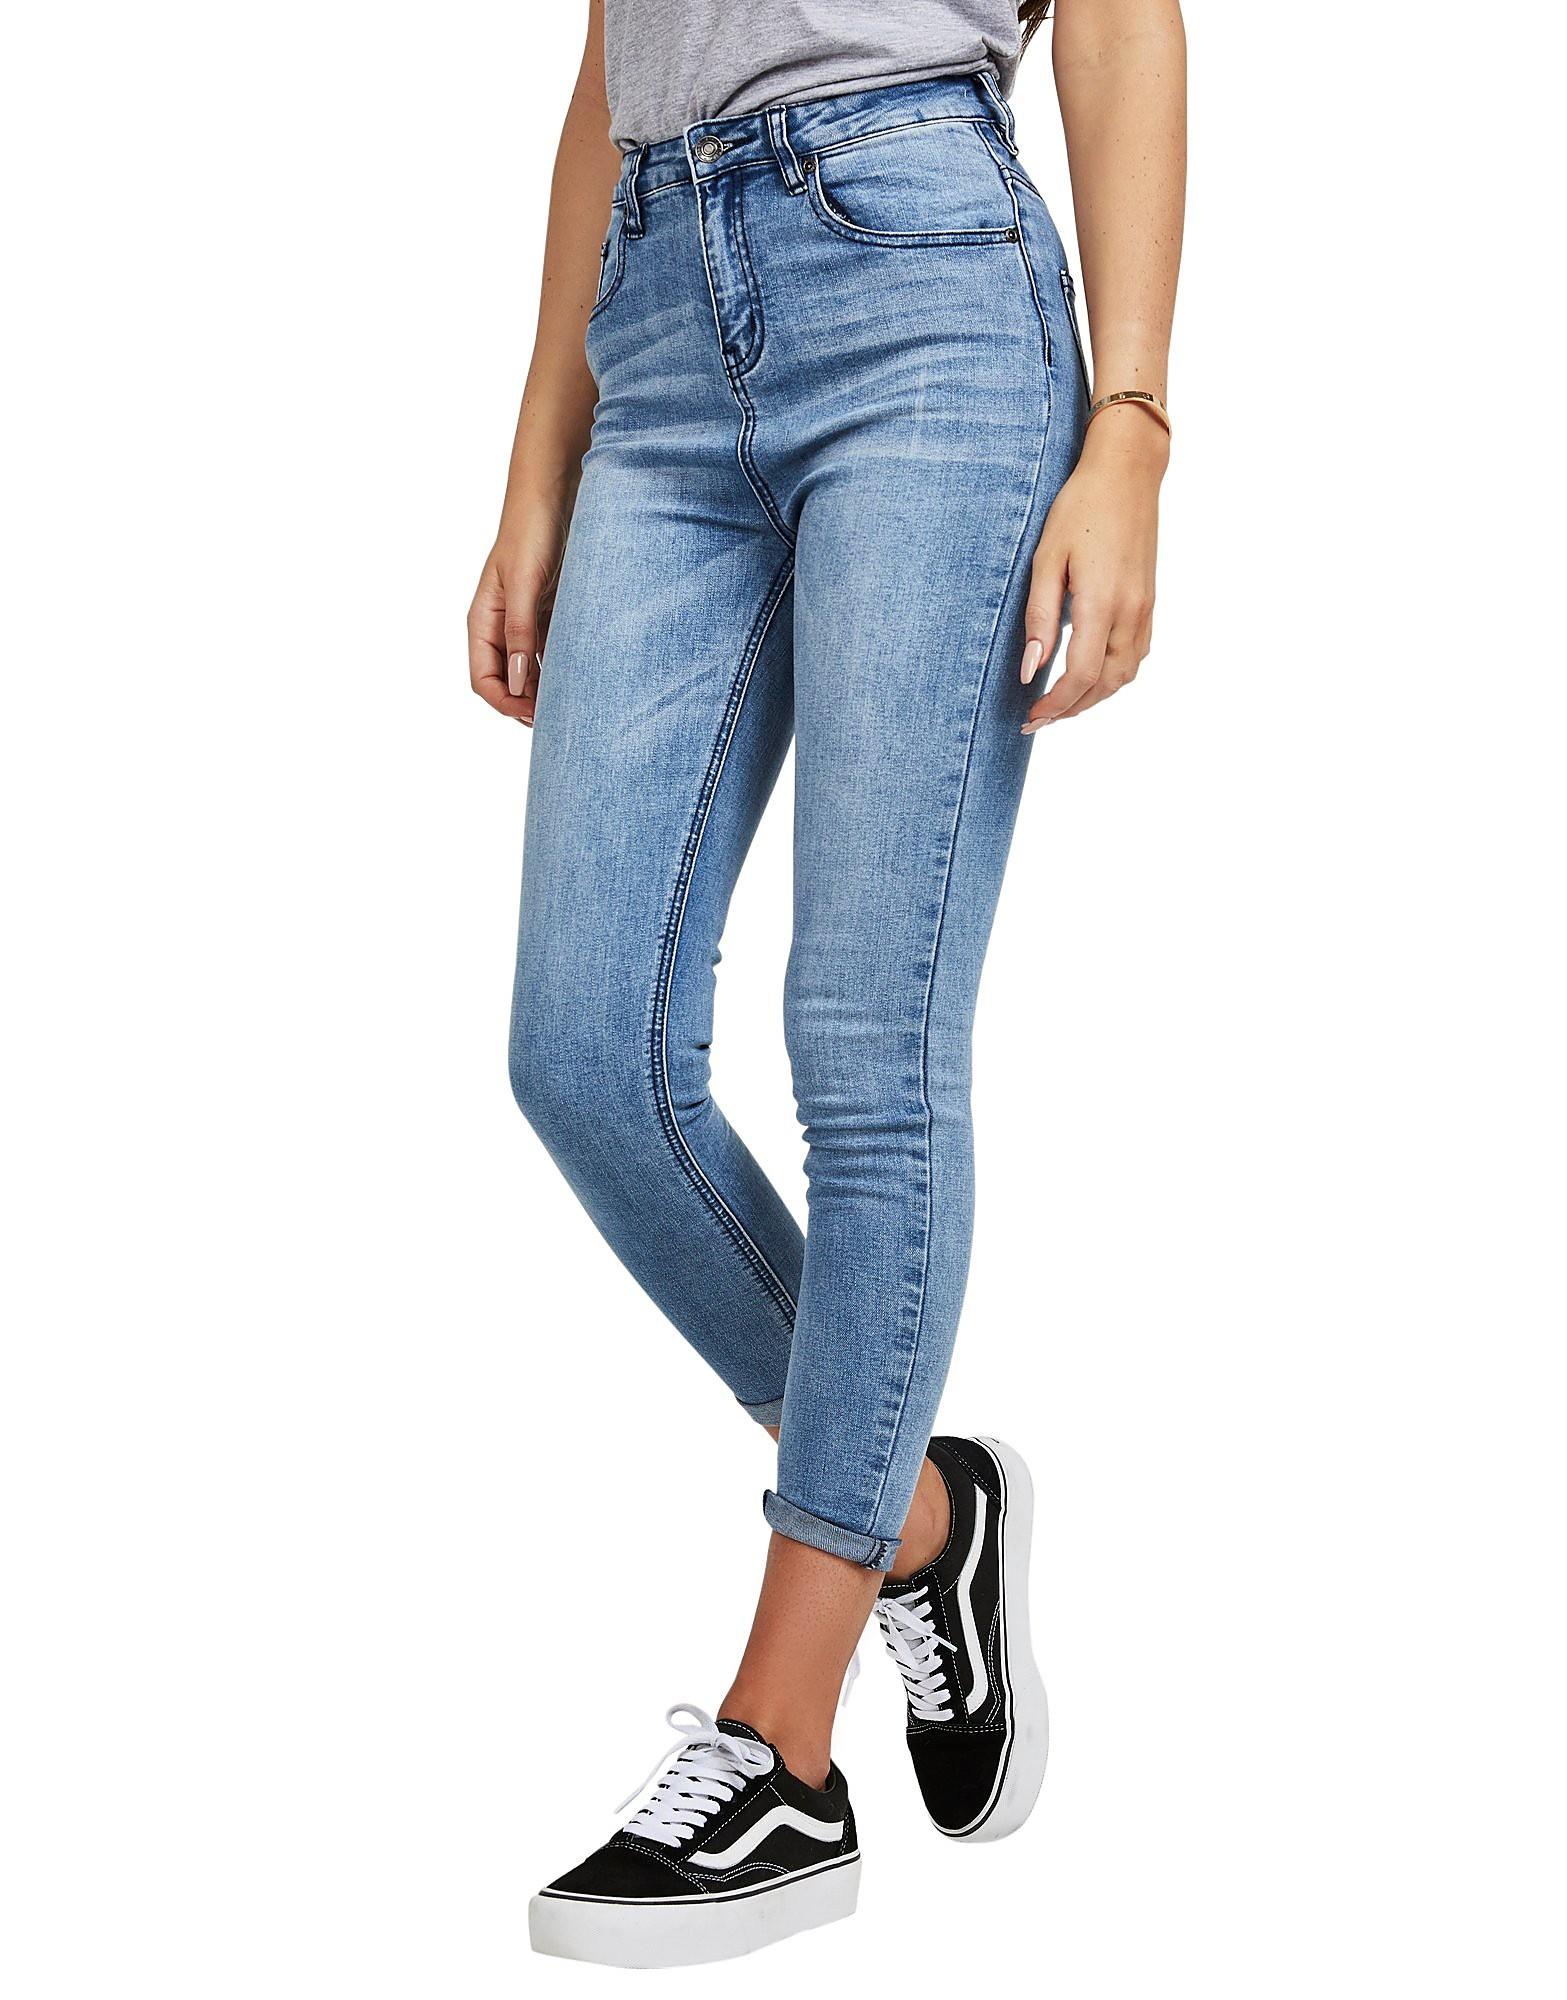 SikSilk High Waist Skinny Jeans